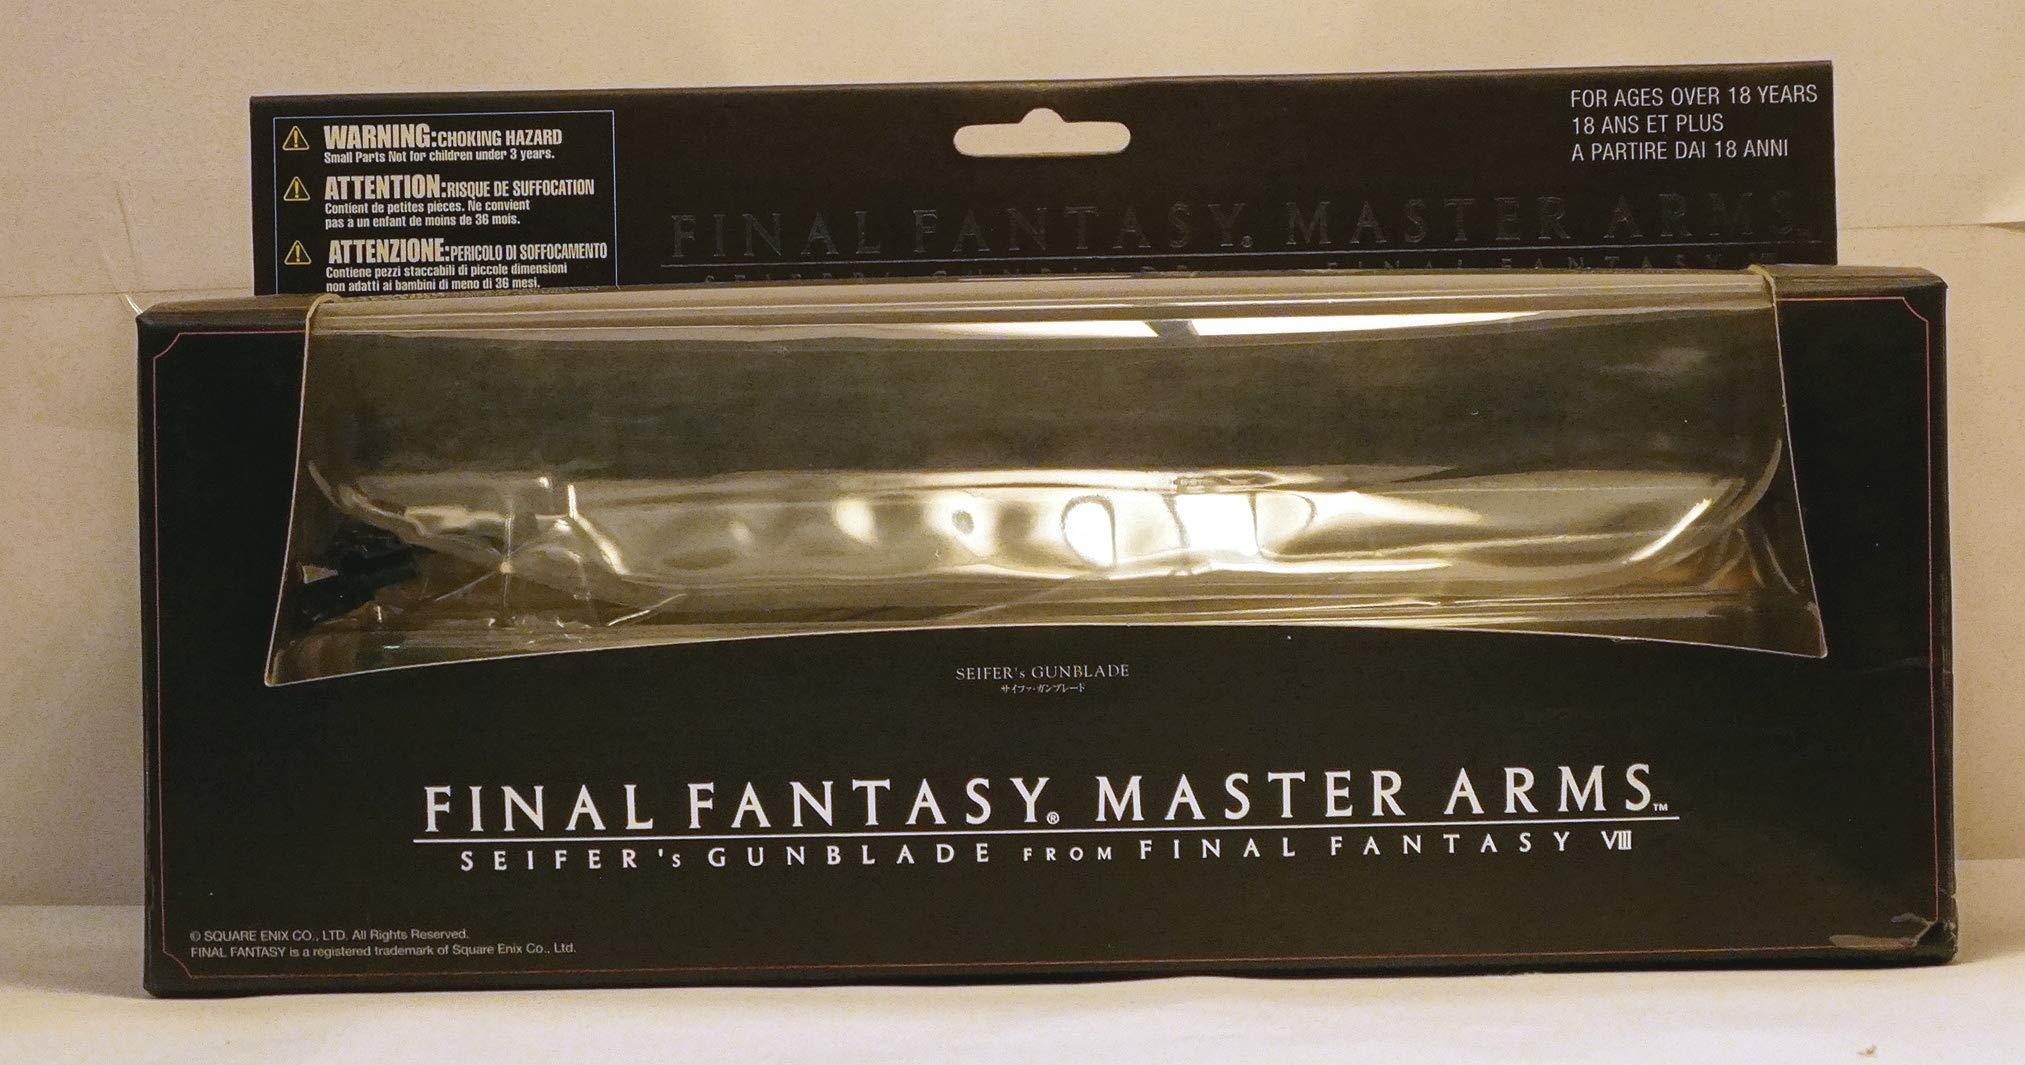 Kotobukiya Final Fantasy Master Arms Die-Cast Replica: Seifer's Gunblade